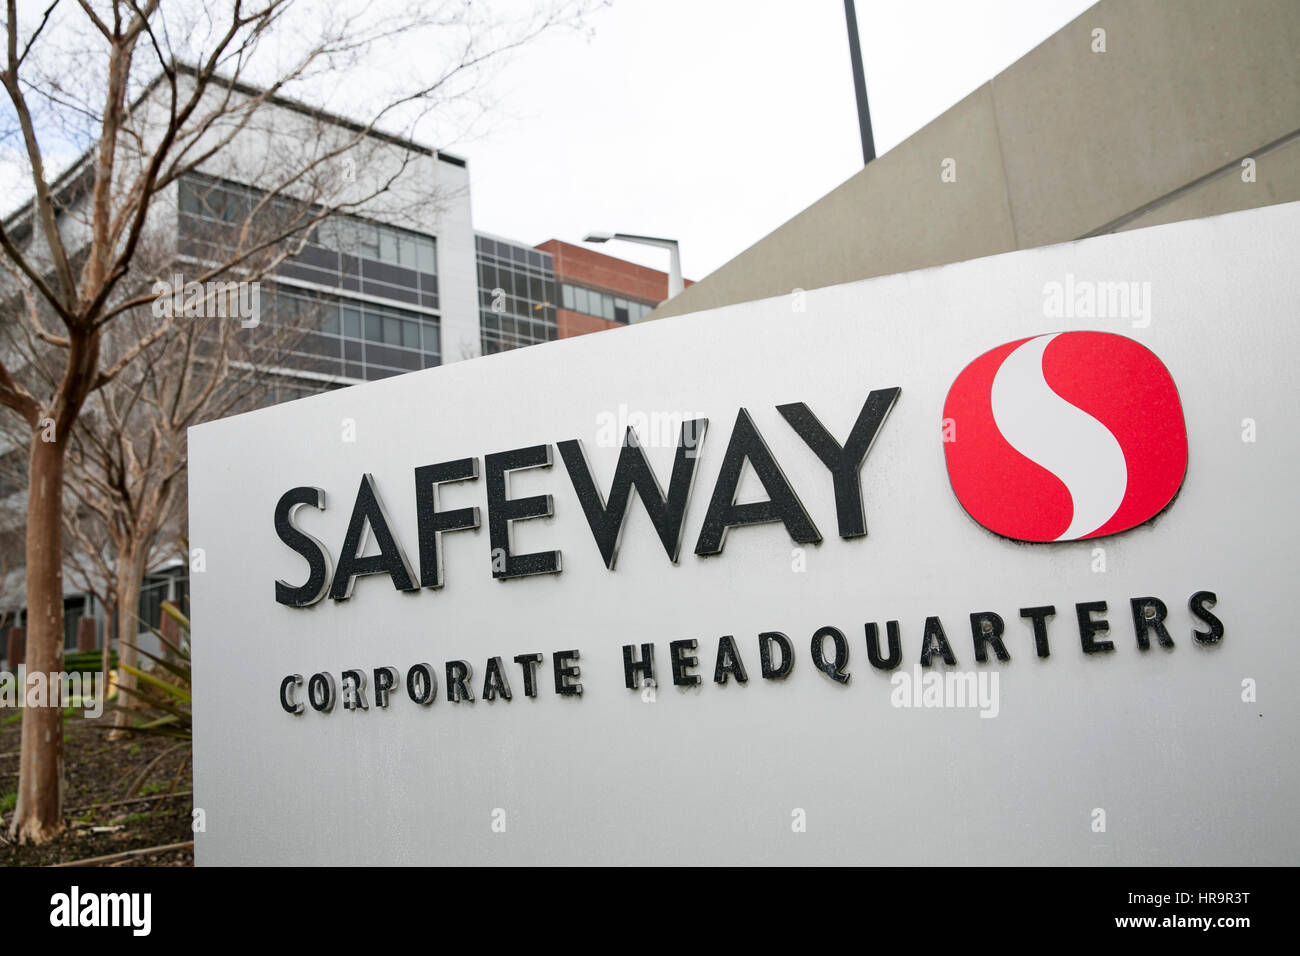 Safeway Logo Stock Photos & Safeway Logo Stock Images - Alamy